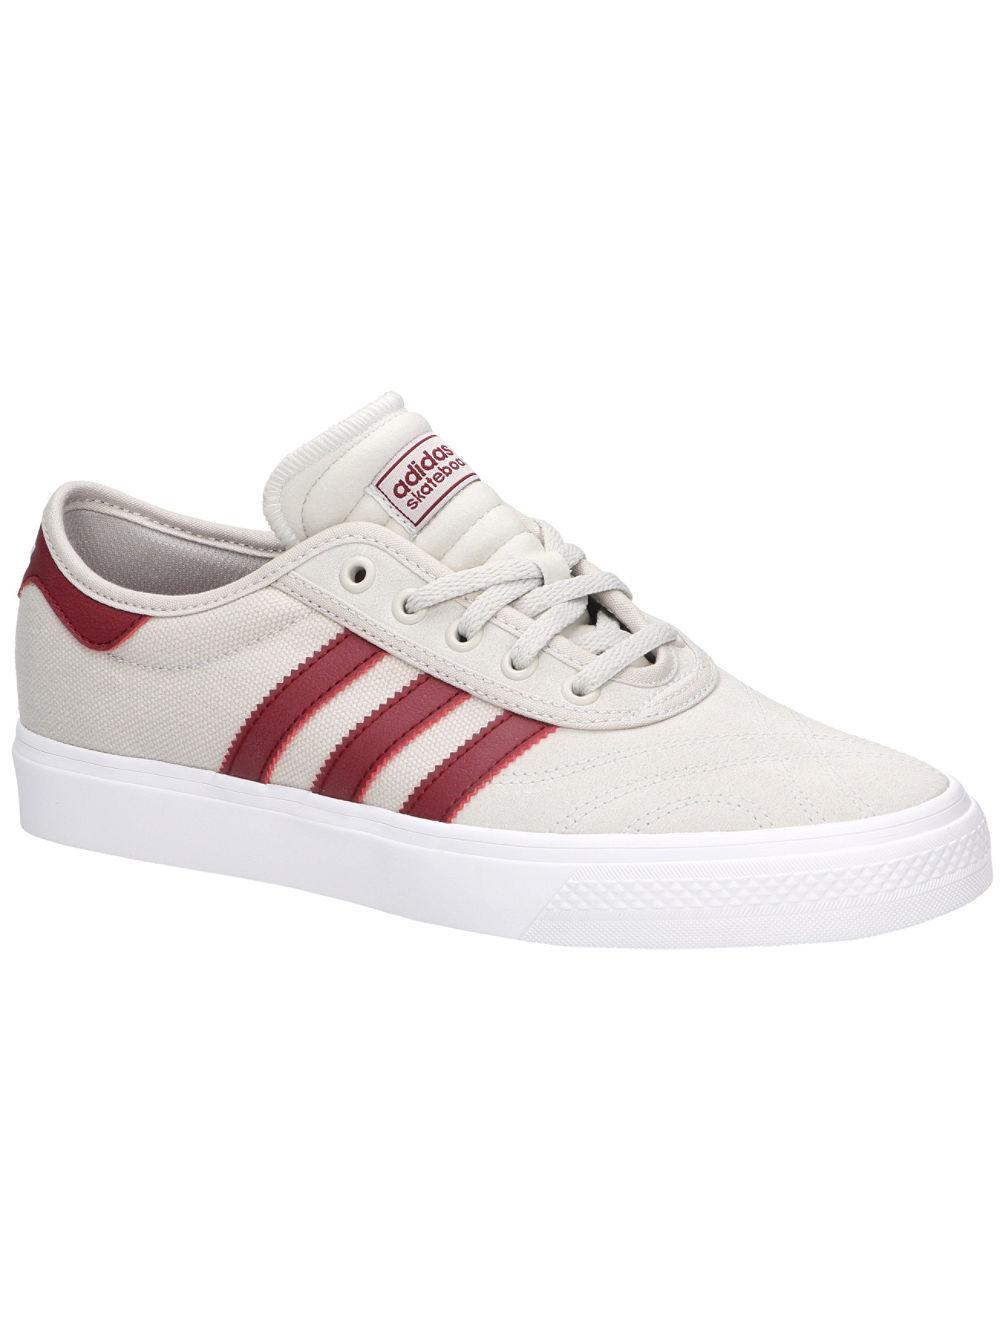 bde322da5e7 Buy adidas Skateboarding Adi Ease Premiere Skate Shoes online at ...